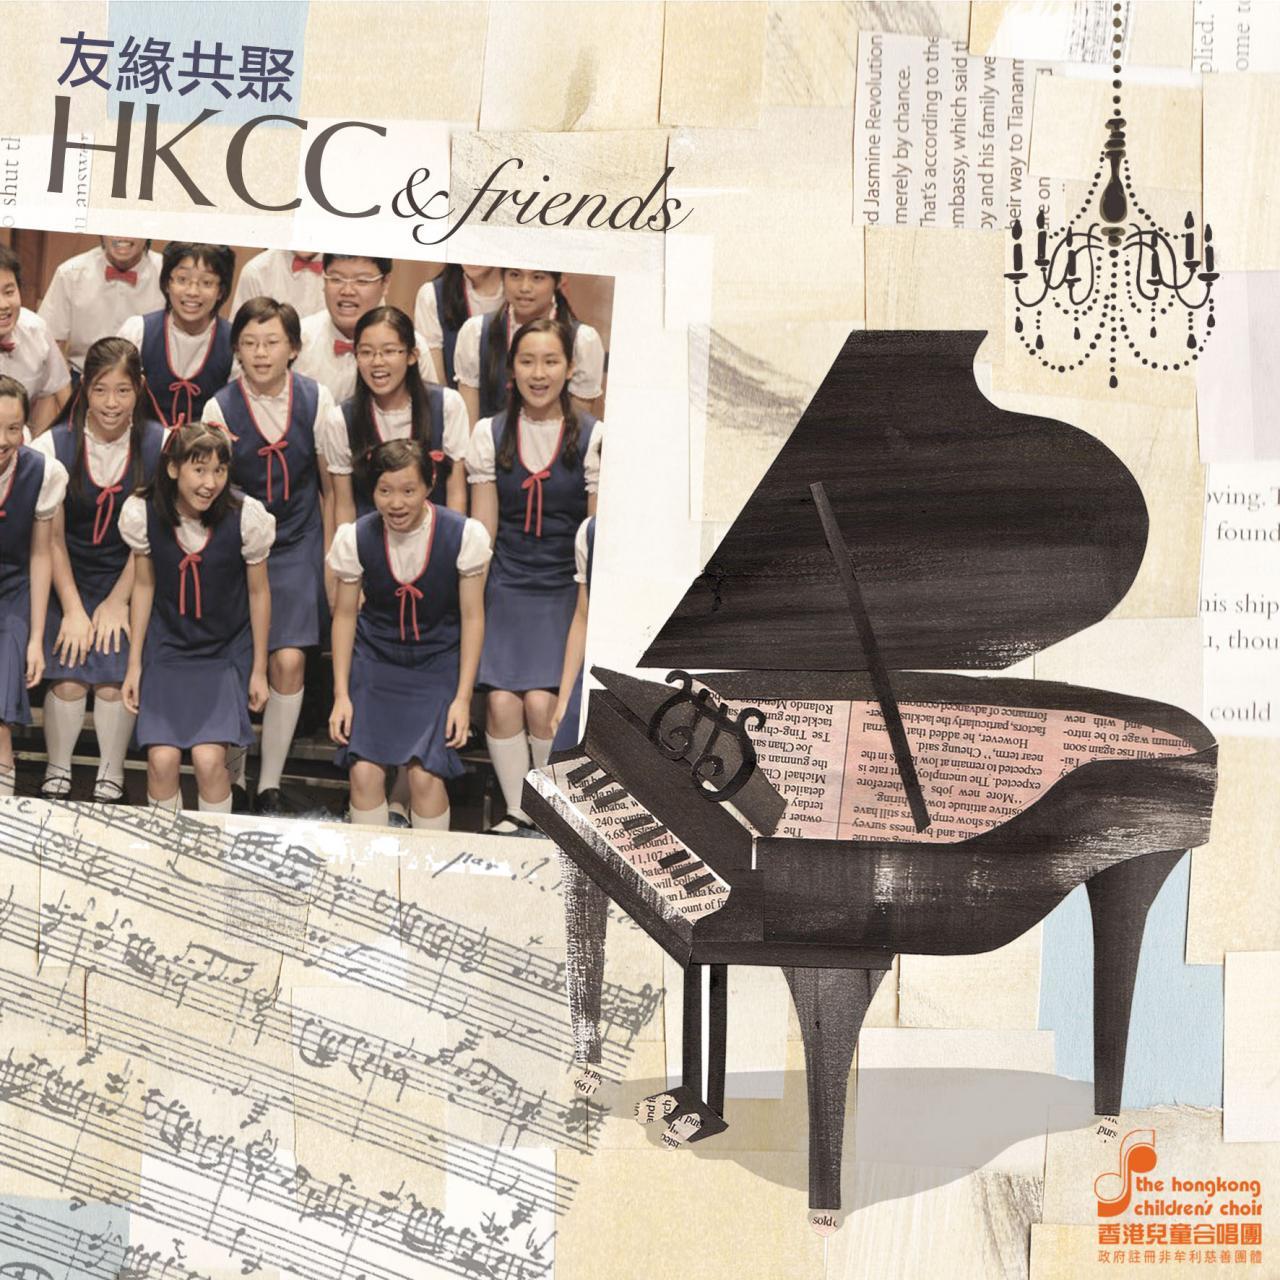 HKCC & Friends